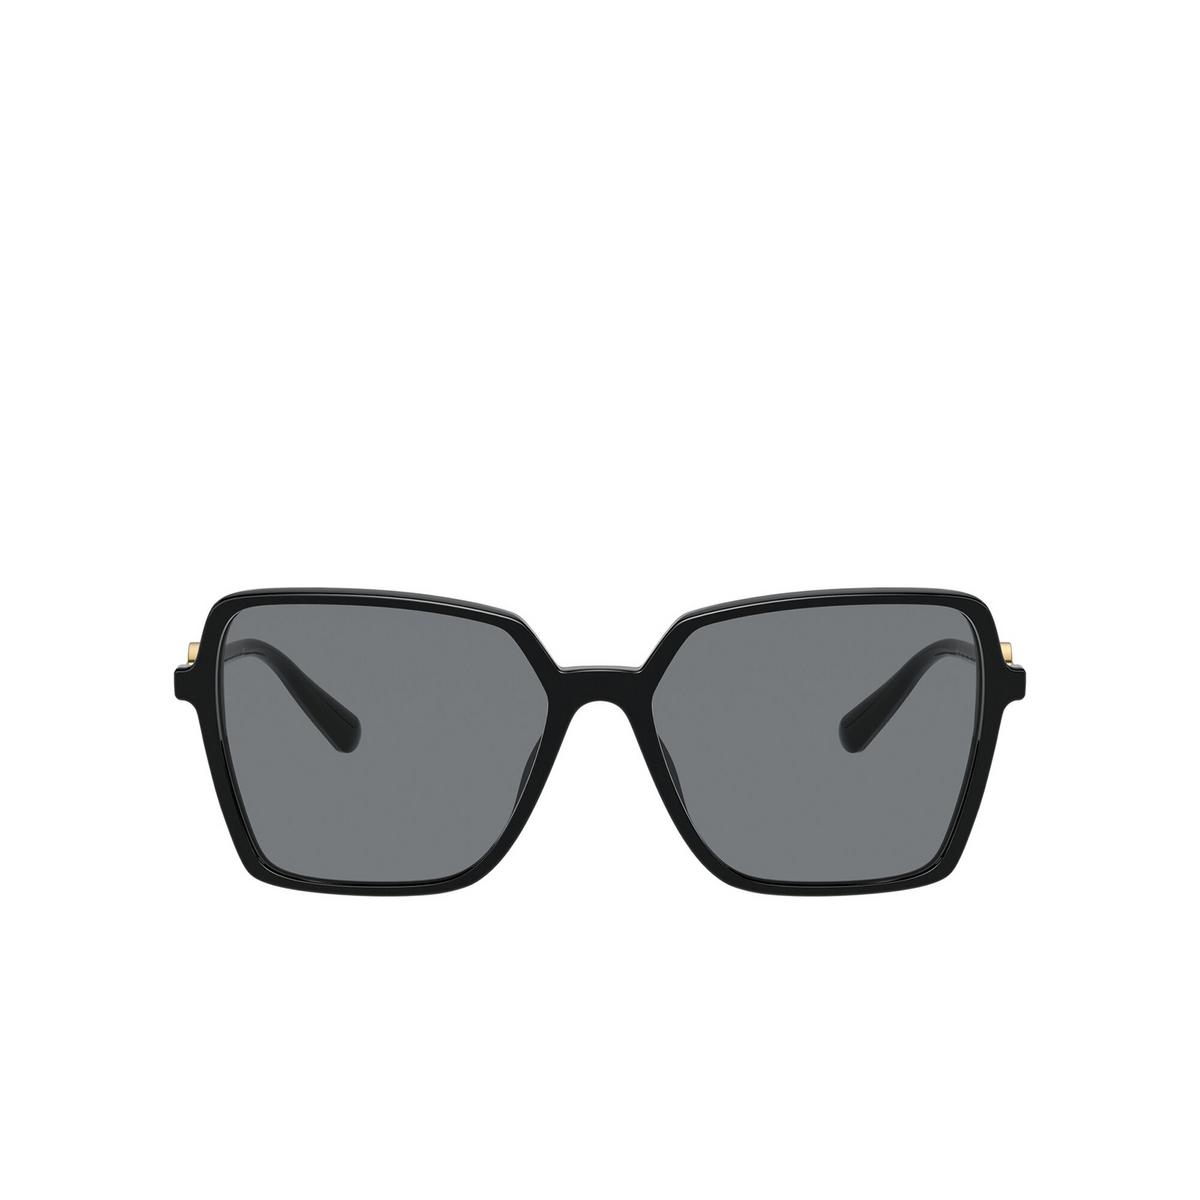 Versace® Square Sunglasses: VE4396 color Black GB1/87 - front view.